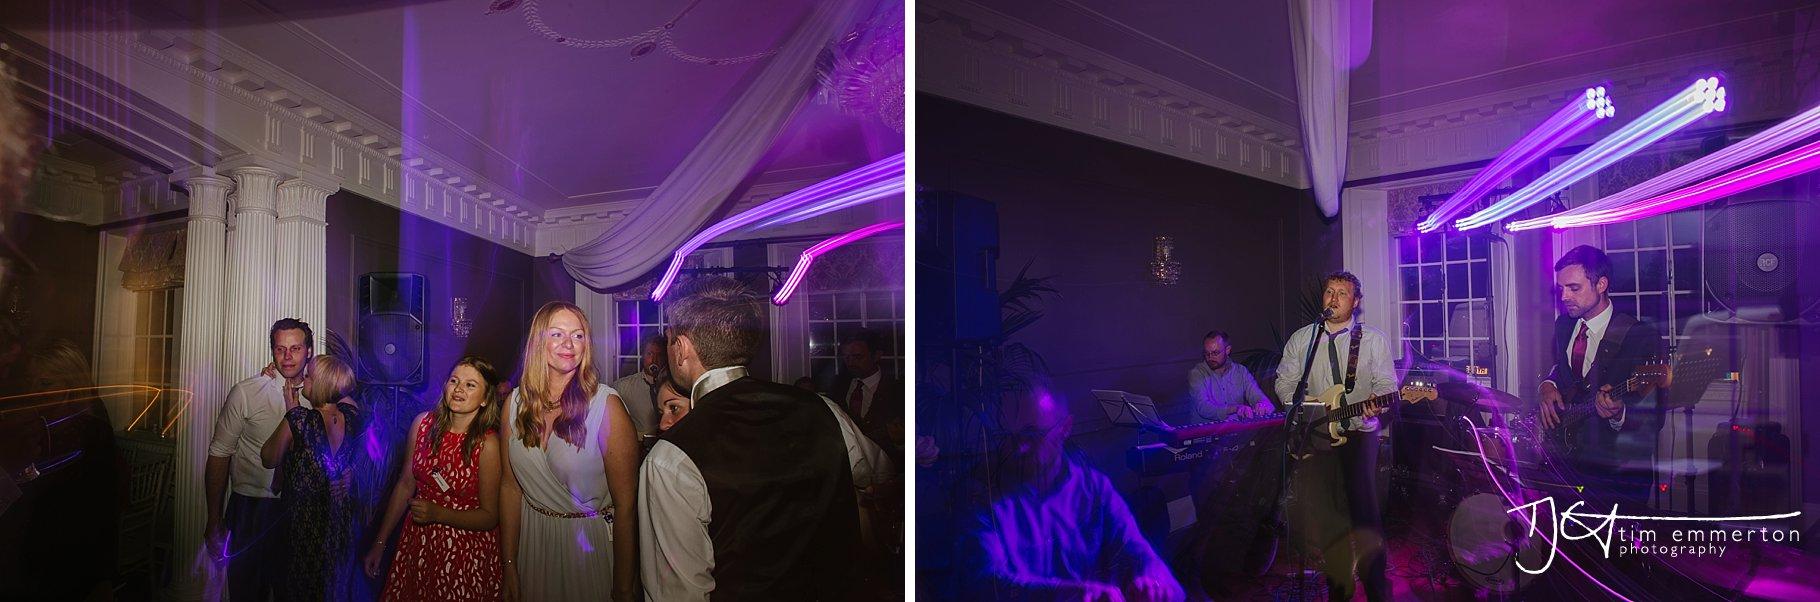 Eaves-Hall-Wedding-Photographer-153.jpg